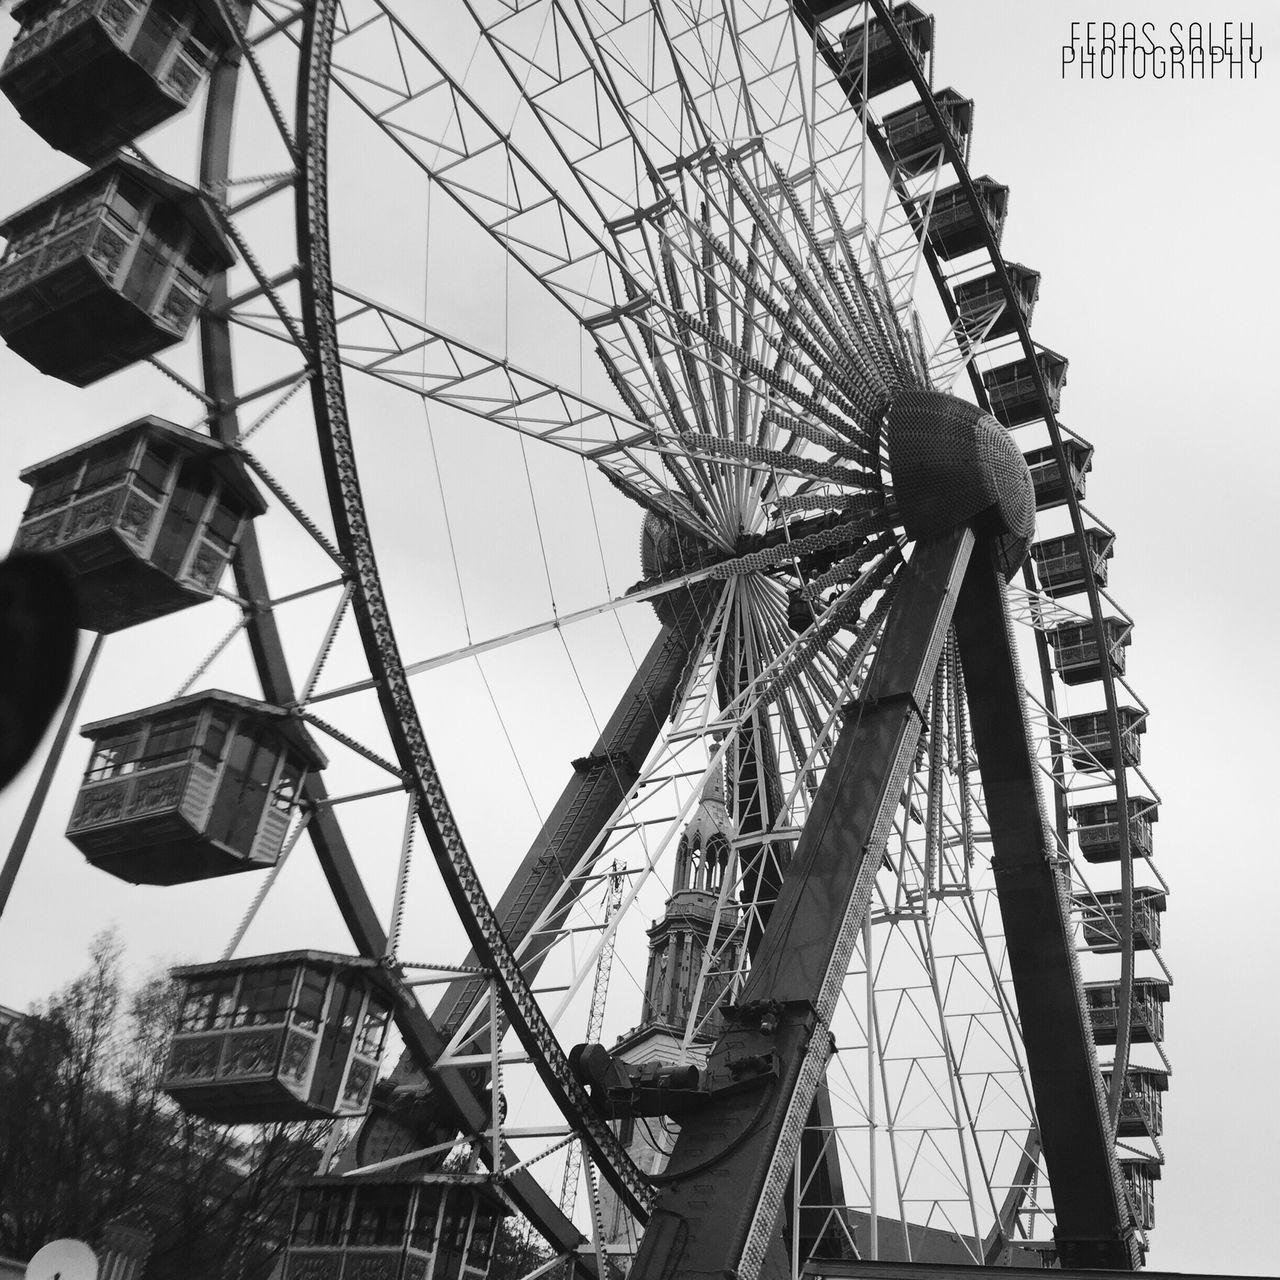 low angle view, built structure, architecture, amusement park, amusement park ride, arts culture and entertainment, ferris wheel, building exterior, sky, clear sky, travel destinations, leisure activity, day, outdoors, travel, tourism, tall - high, city, famous place